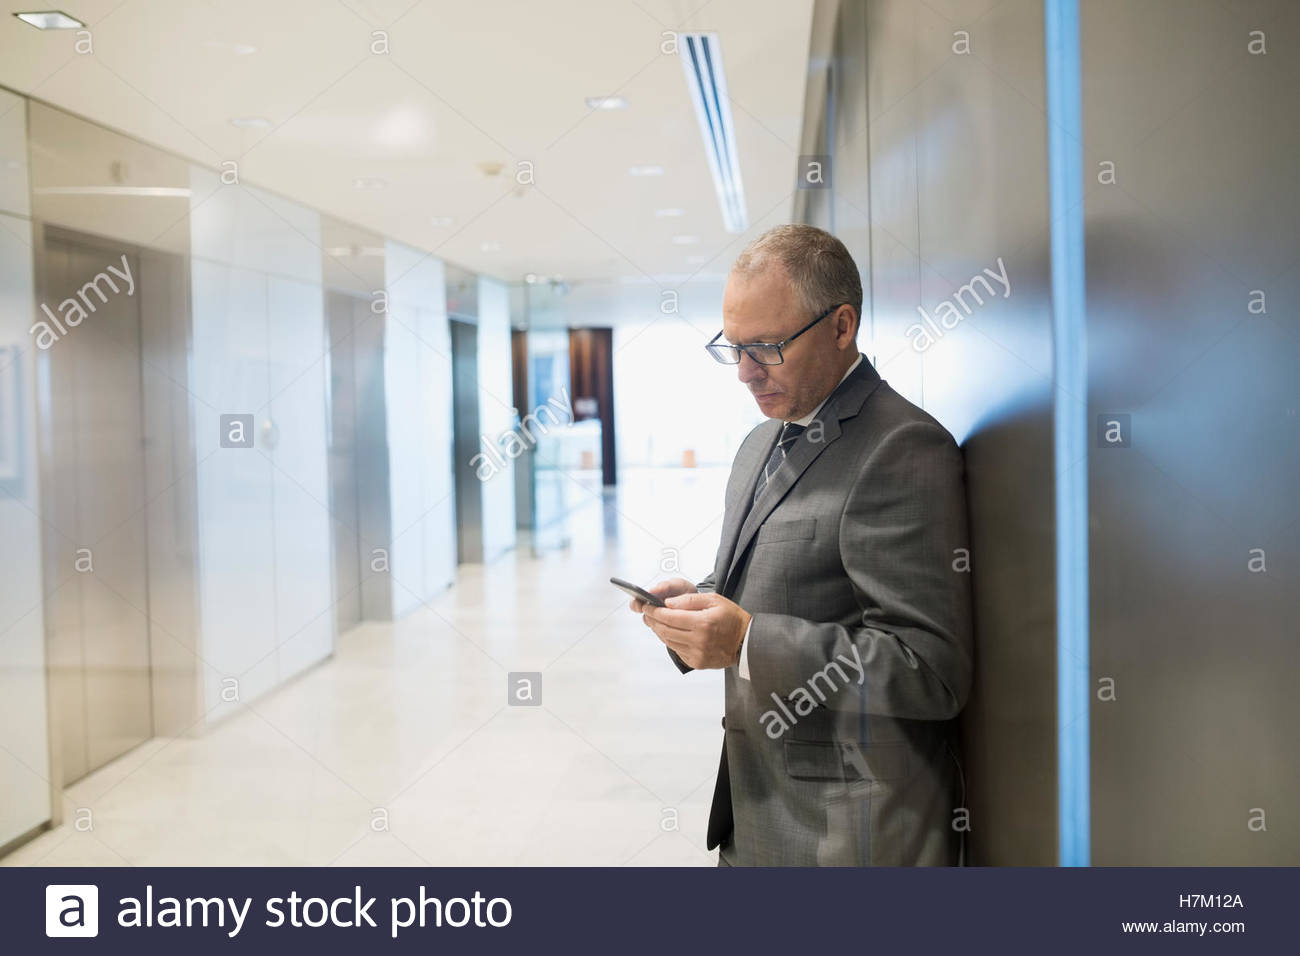 Businessman texting in office corridor Photo Stock